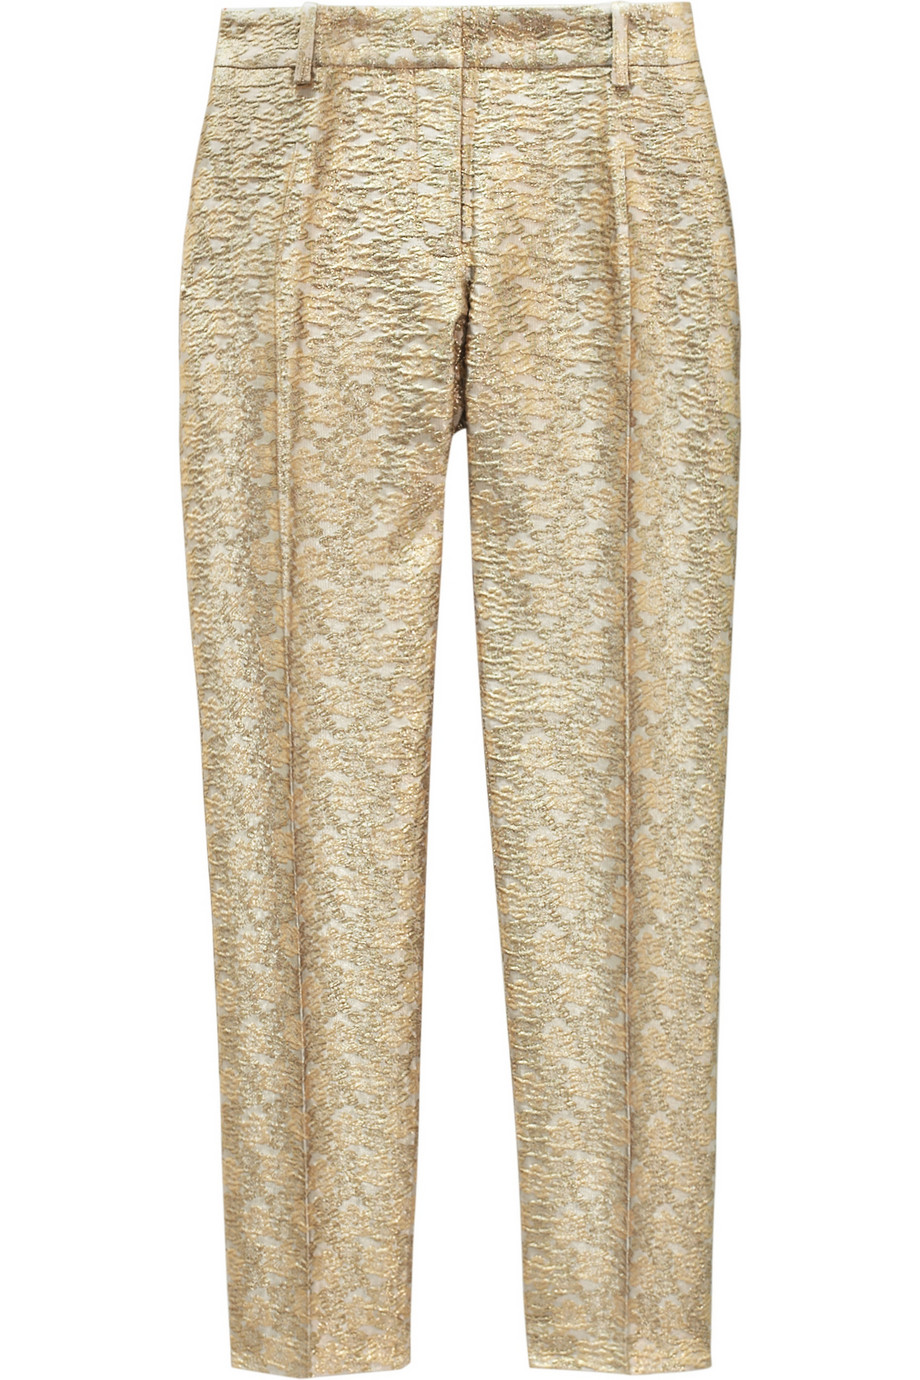 paul joe sister hector brocade straightleg pants in gold. Black Bedroom Furniture Sets. Home Design Ideas